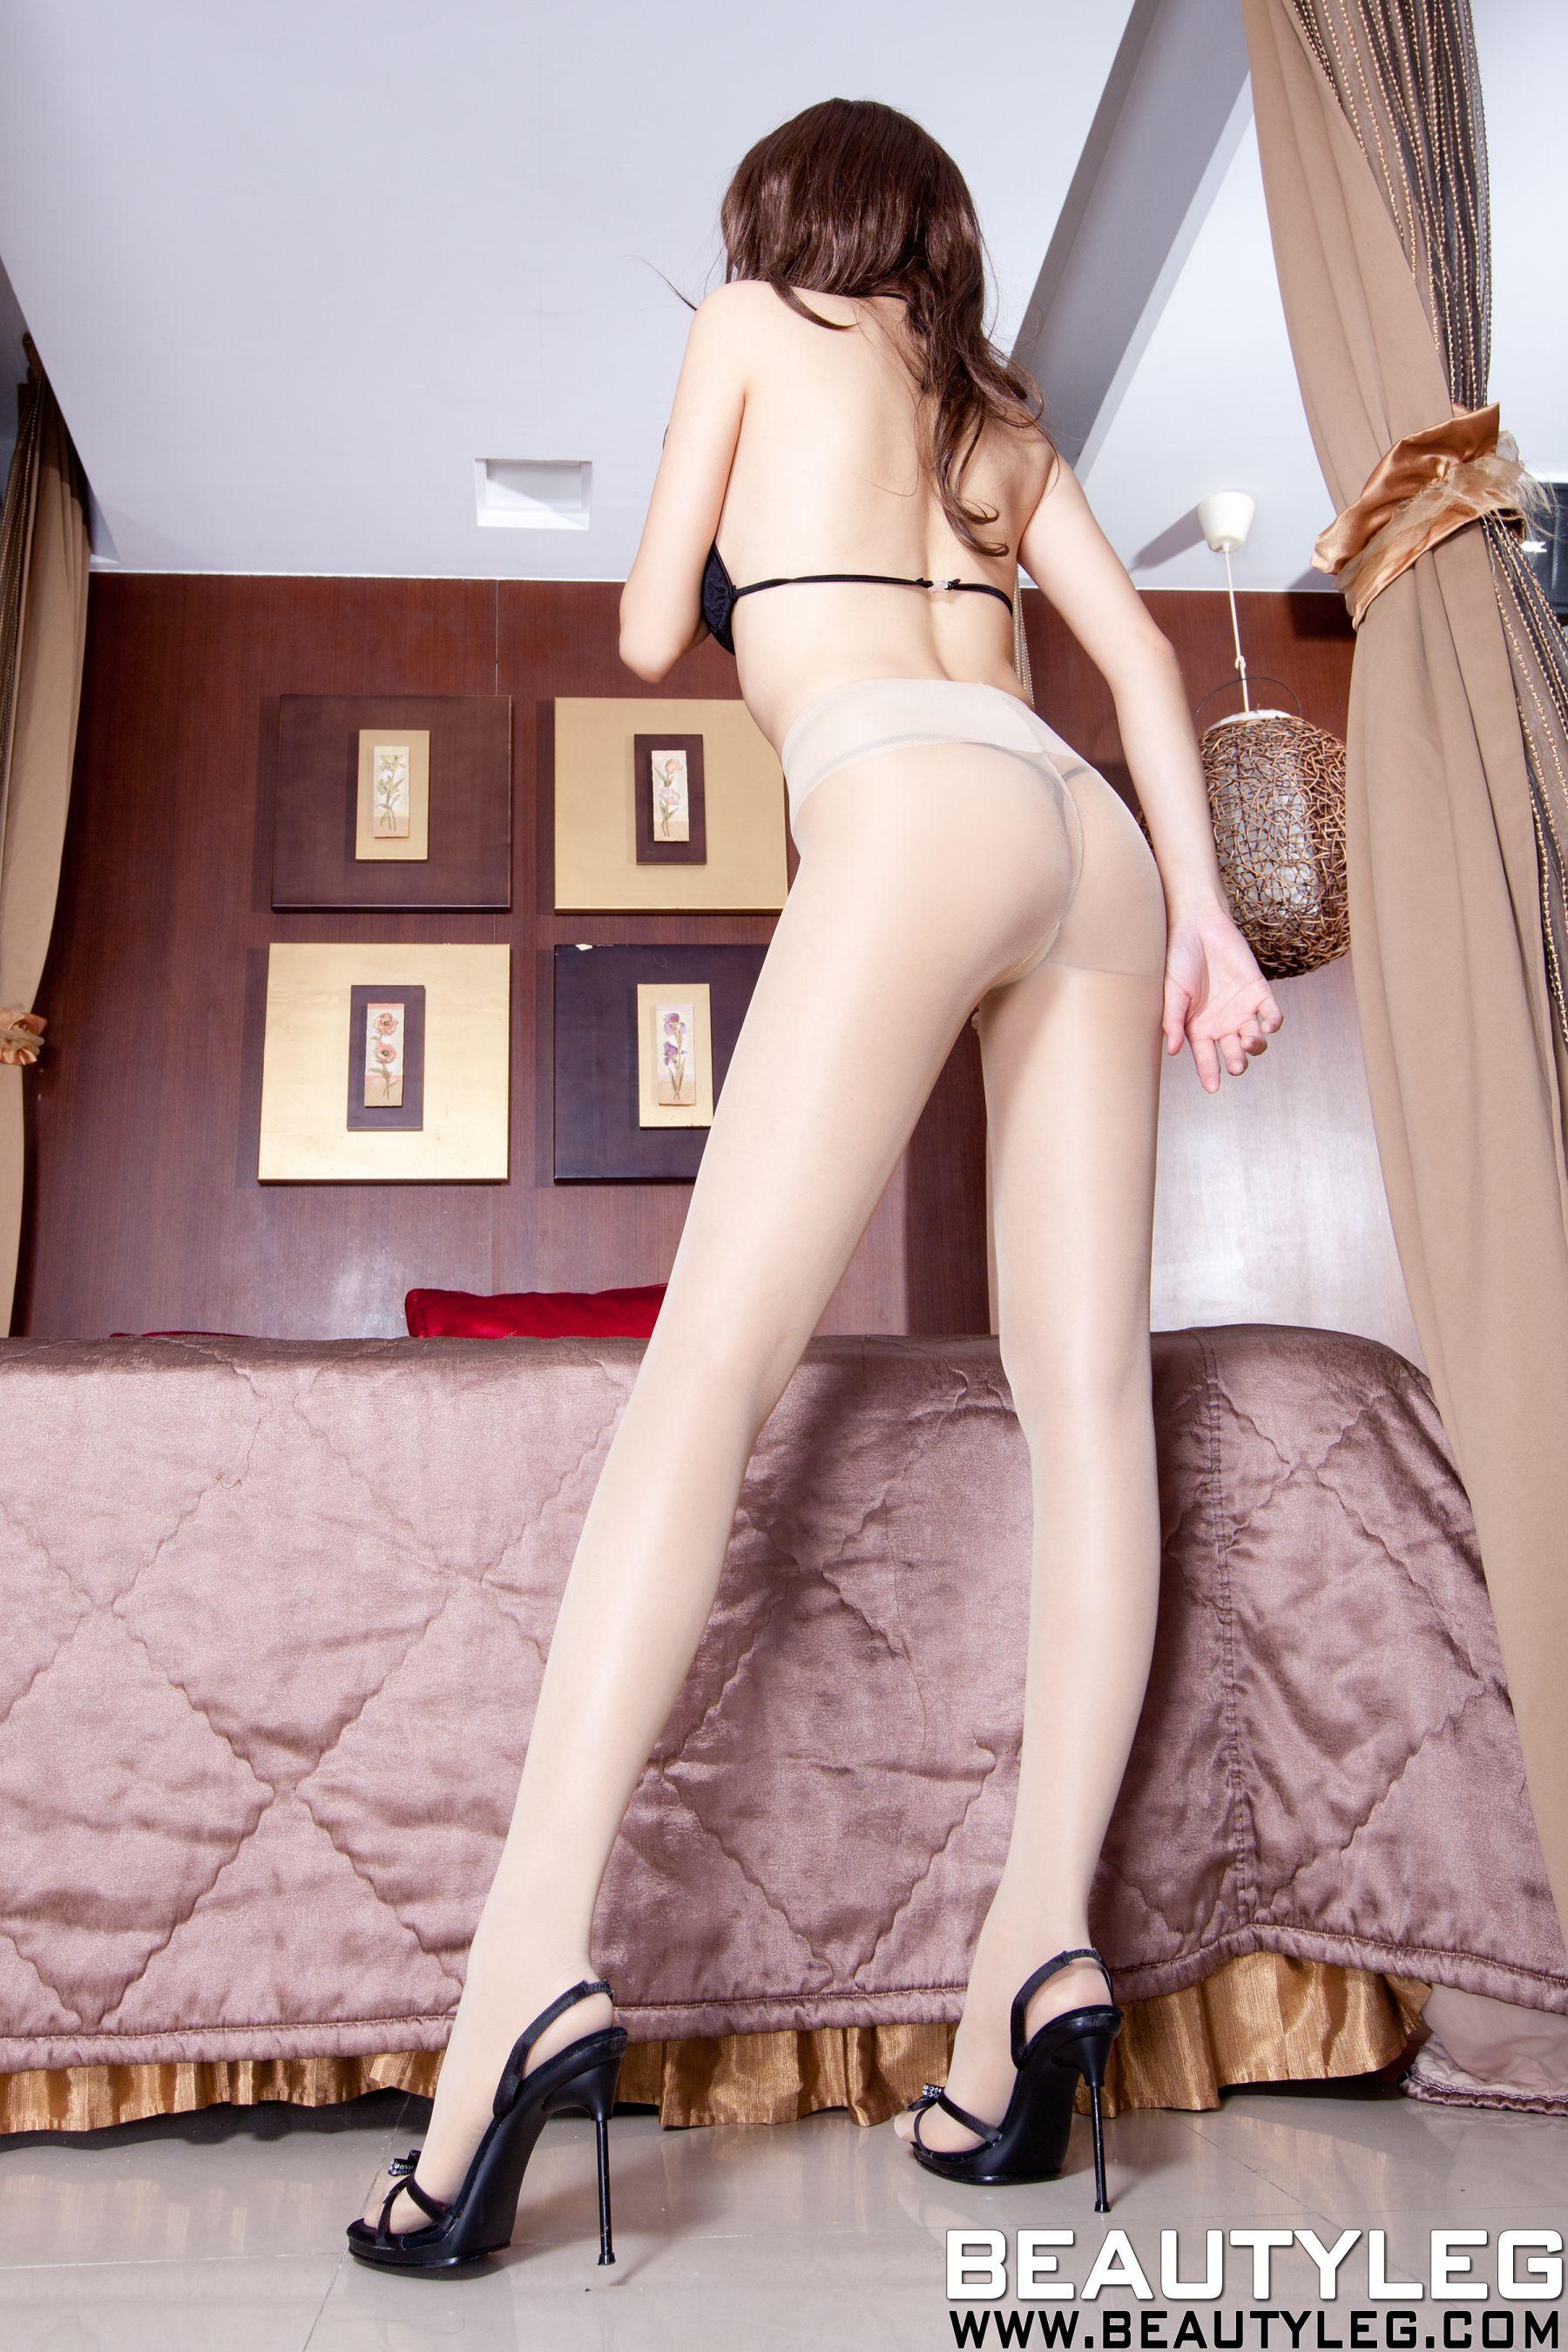 VOL.1319 [Beautyleg]丁字裤丝袜美腿肉丝美腿:腿模Linda高品质写真套图(64P)